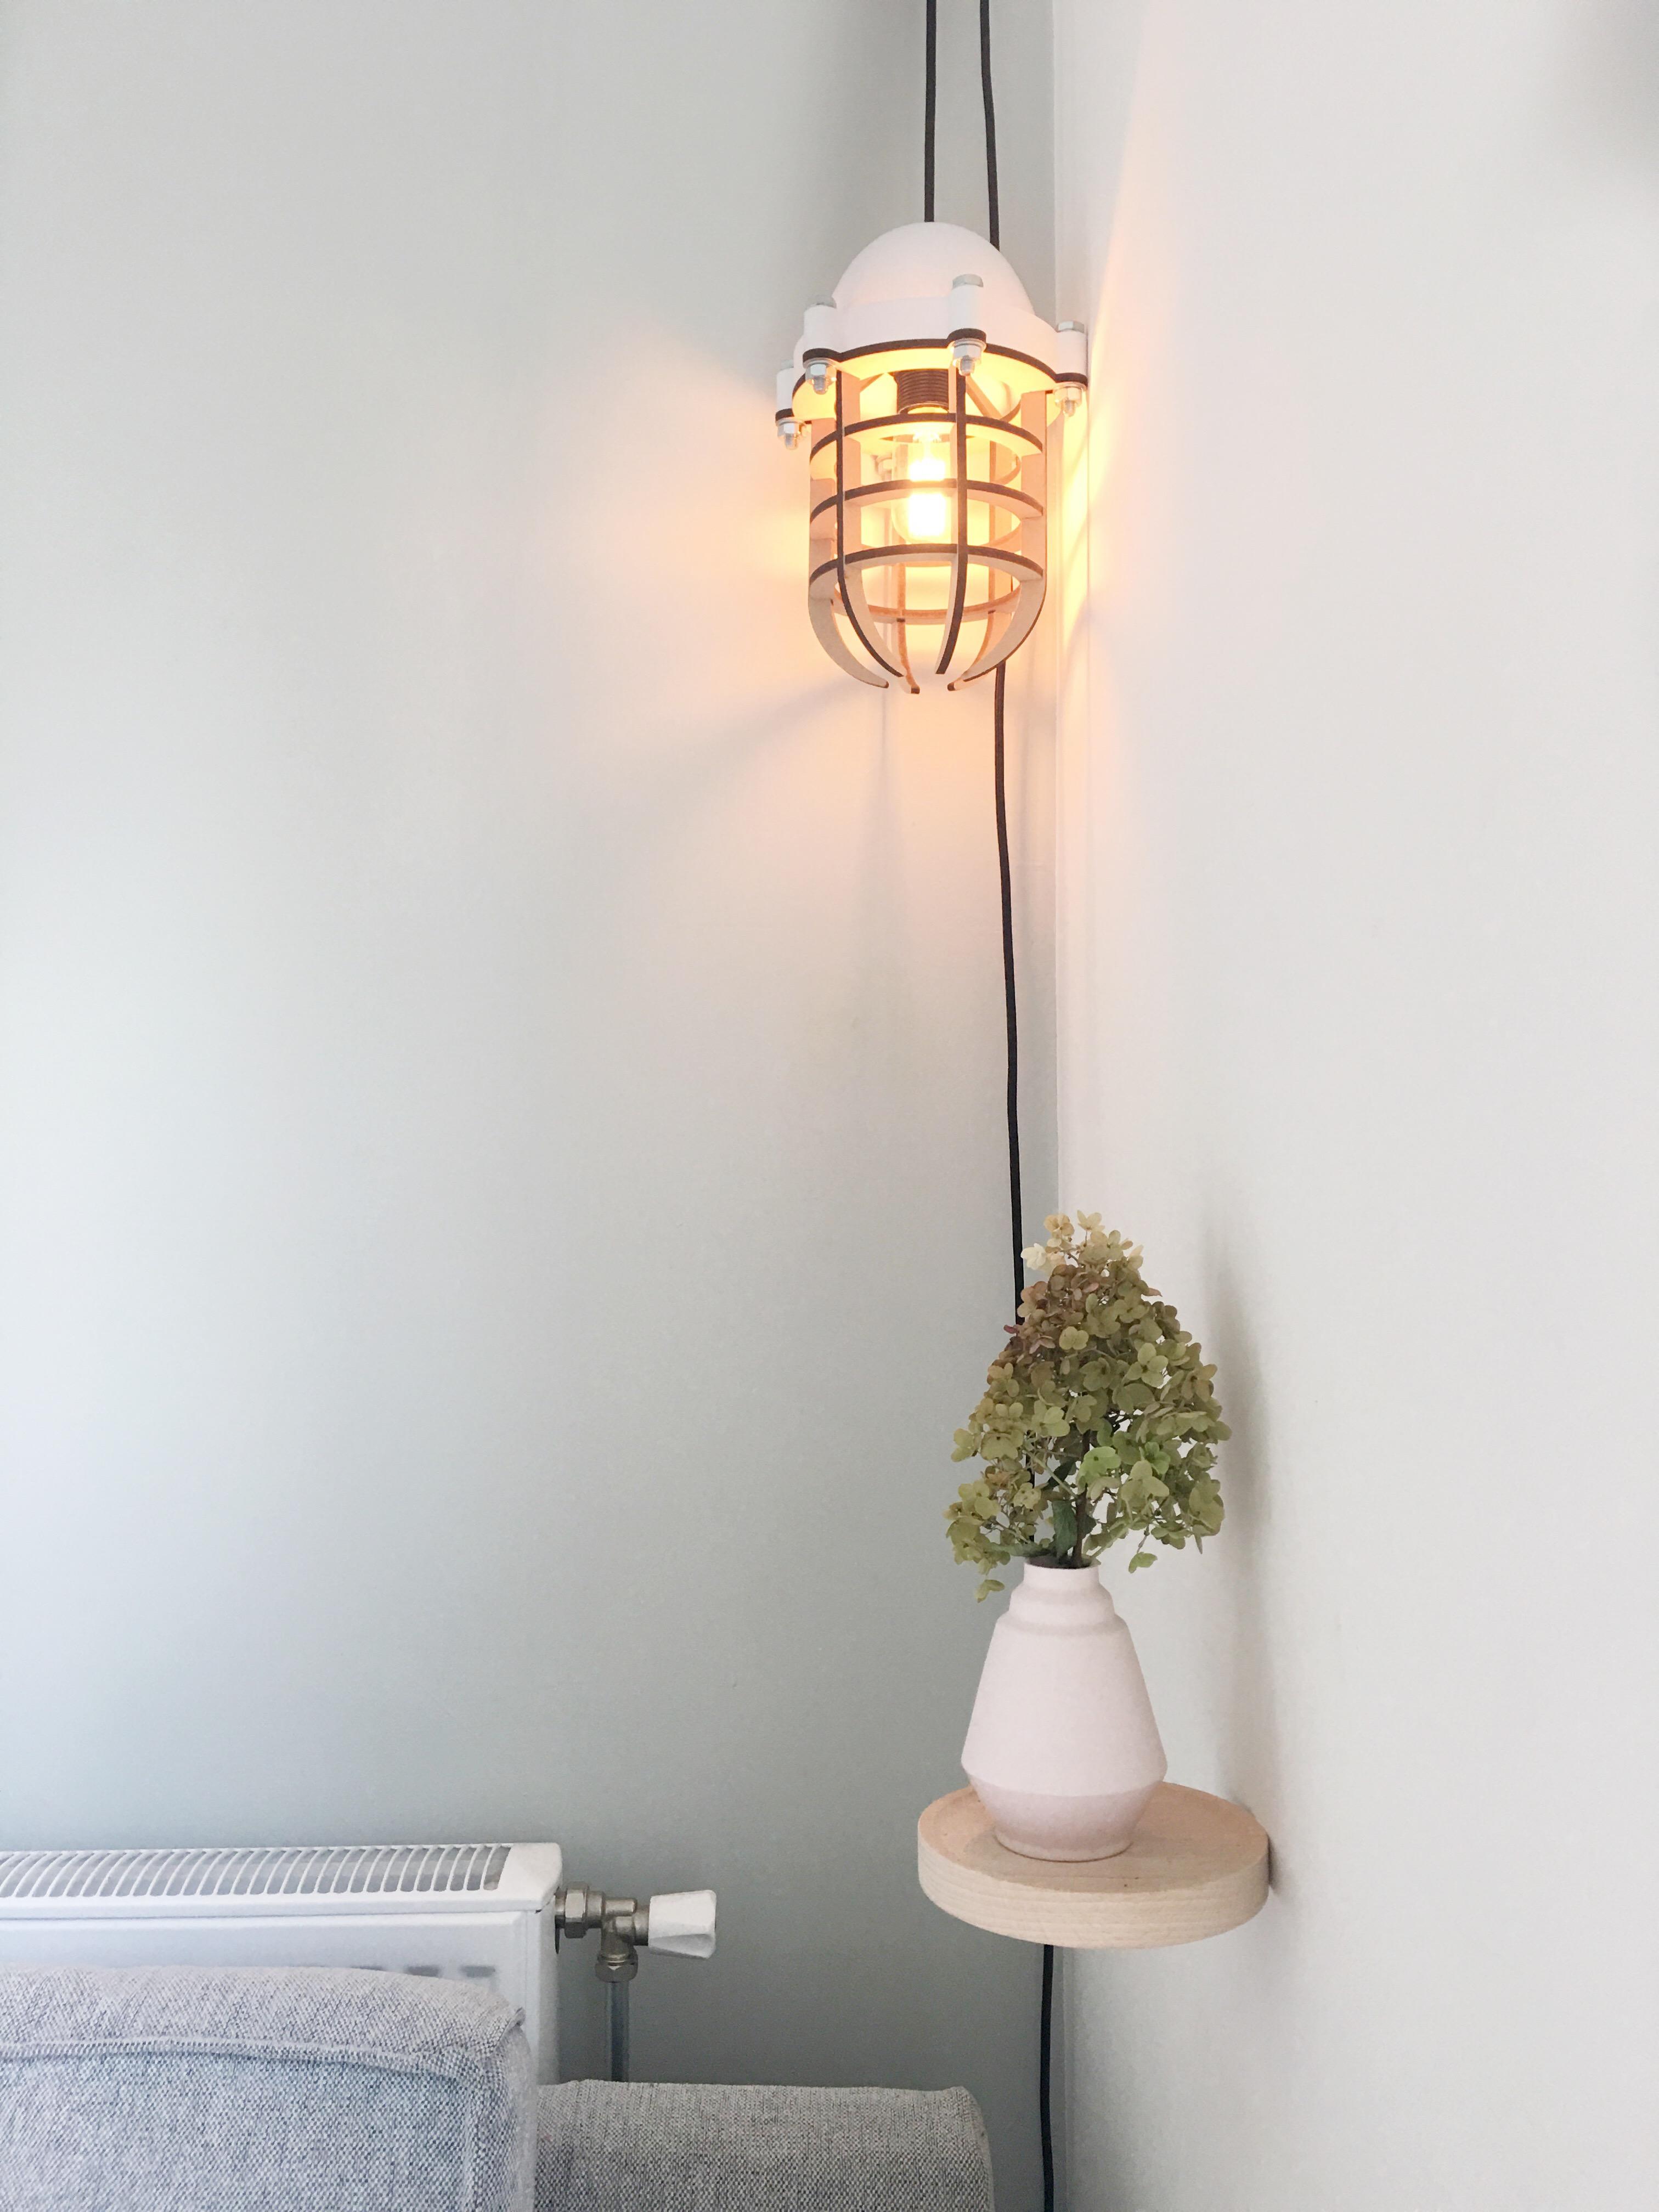 Slaapkamer Lamp Hoeveel Watt